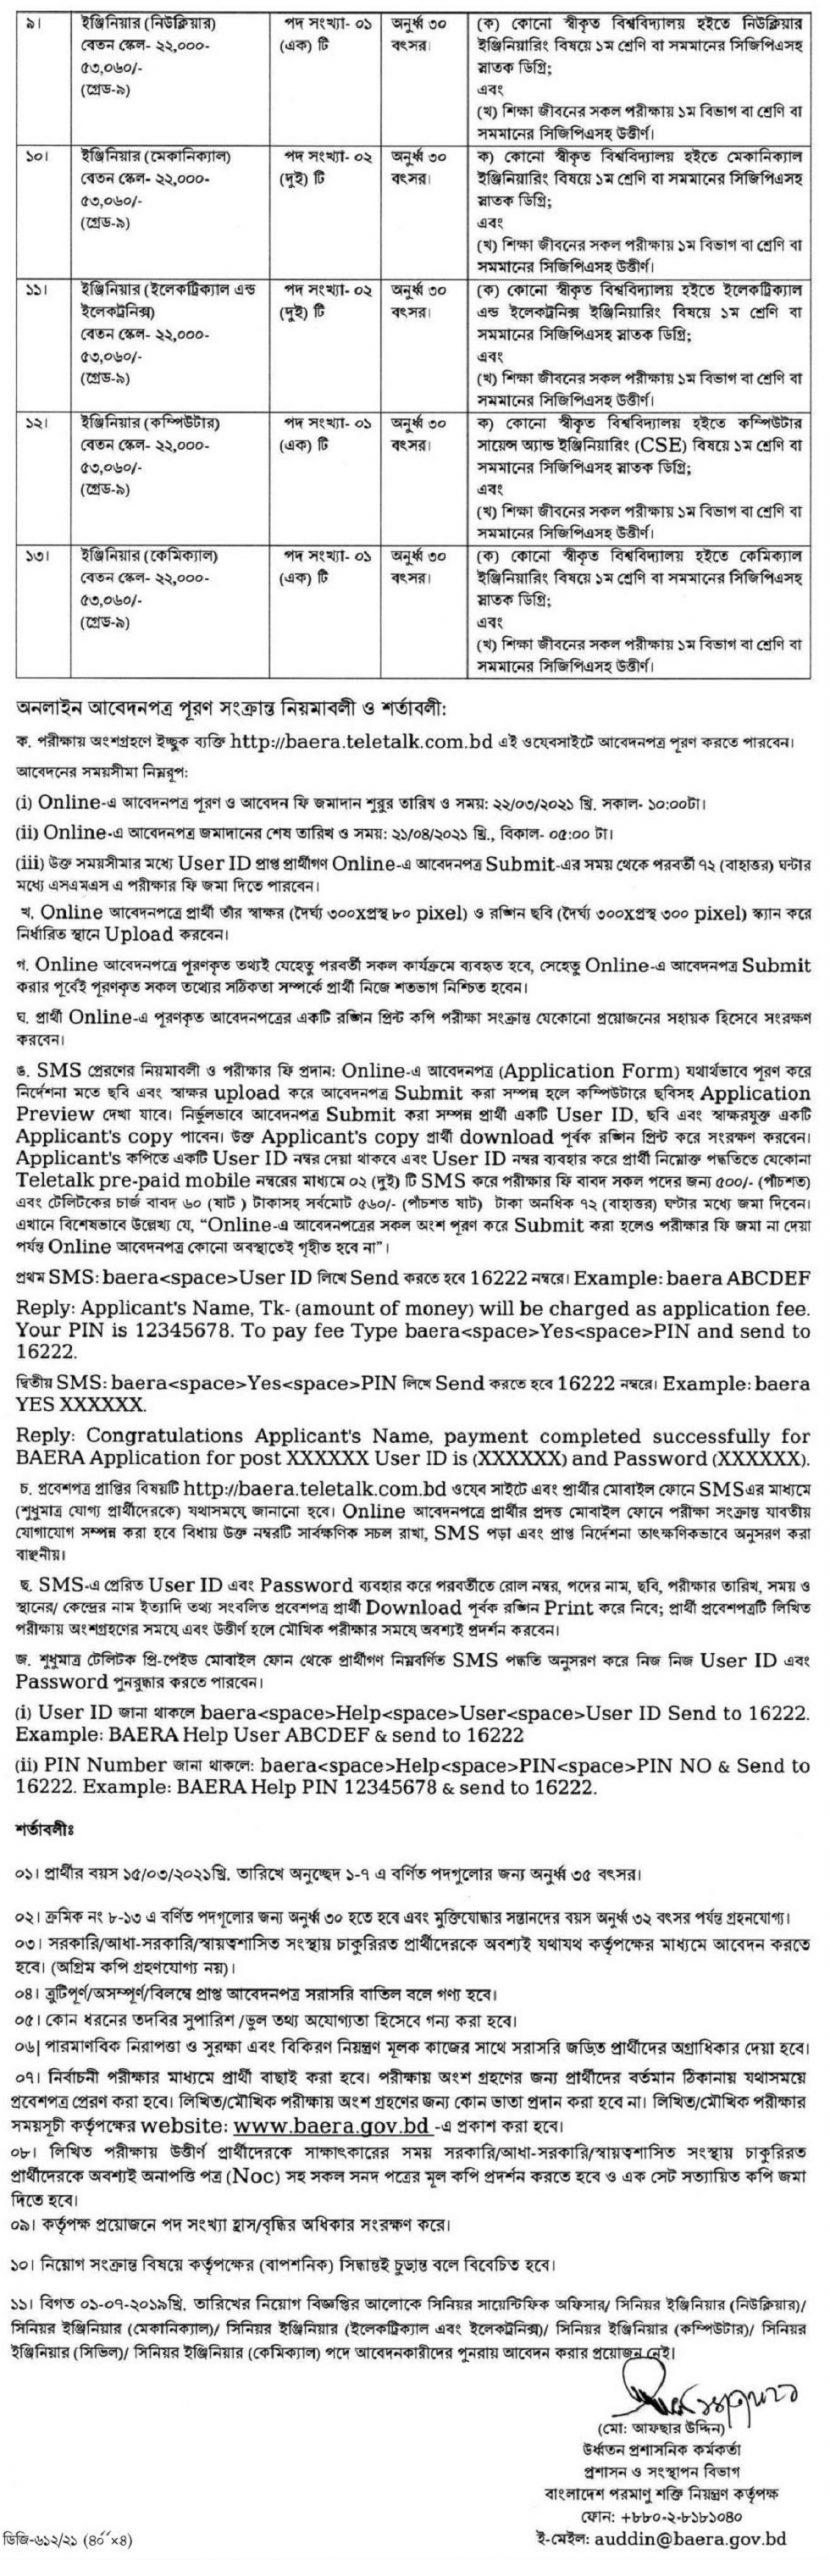 Bangladesh Atomic Energy Commission Job Circular 21 April 2021